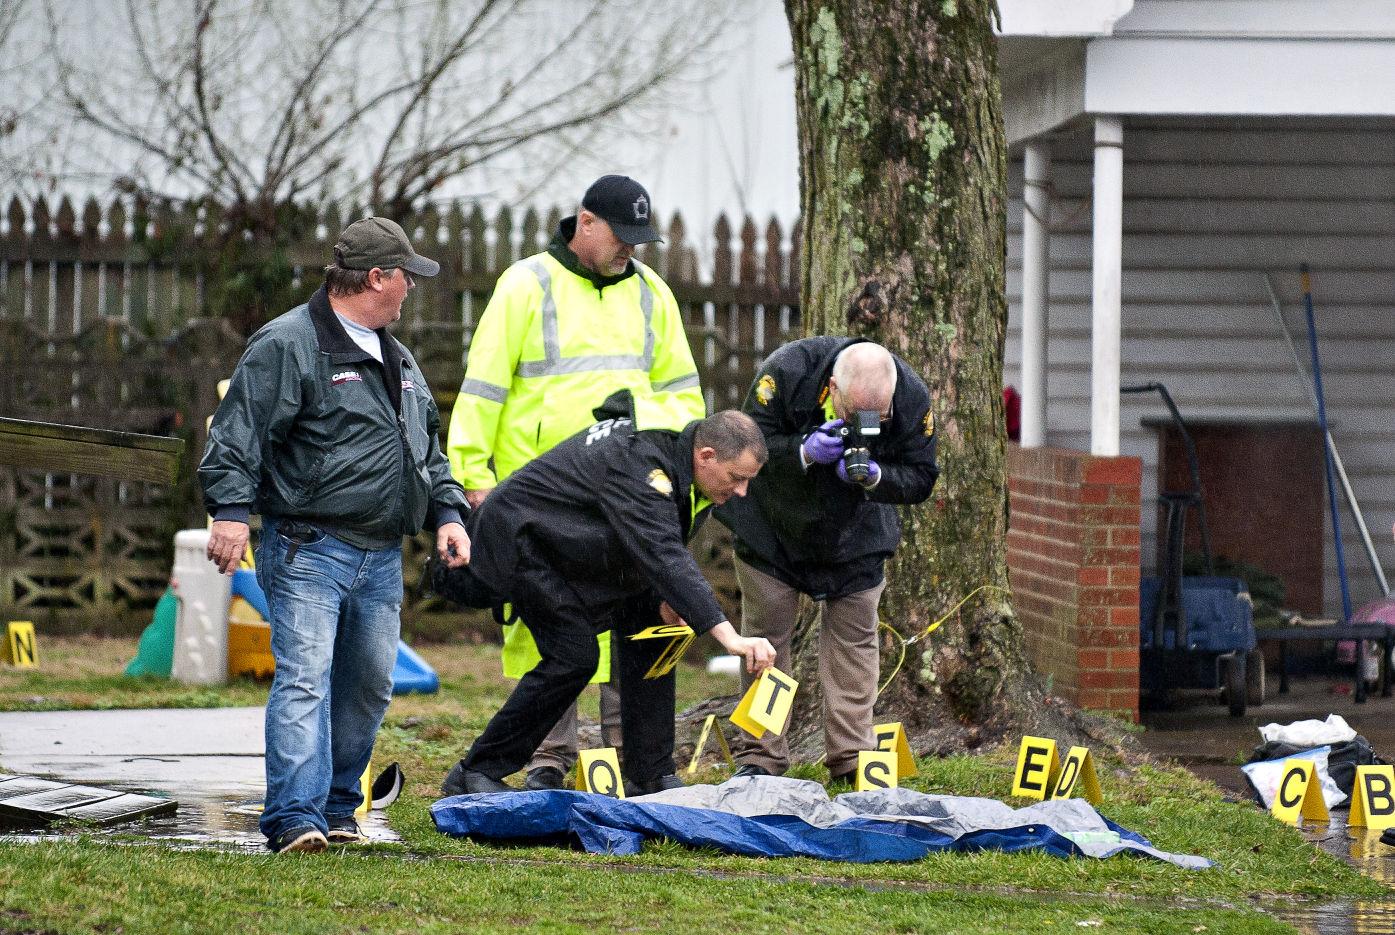 Simpson County sheriffu0027s deputy shot while trying